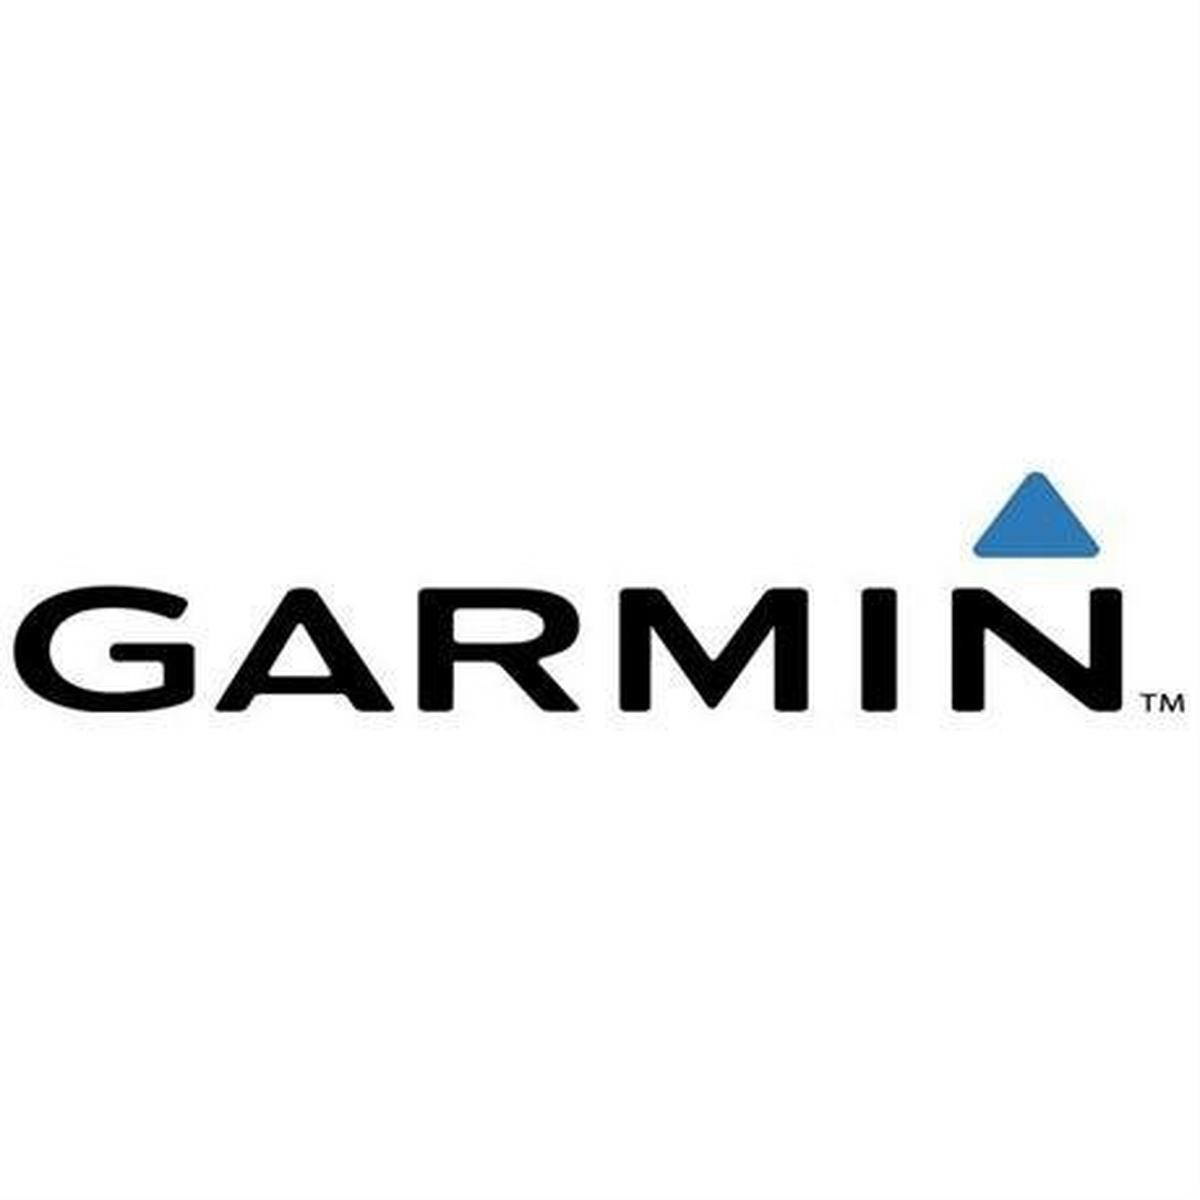 Garmin GPS Spare/Accessory: eTrex Carrying Case